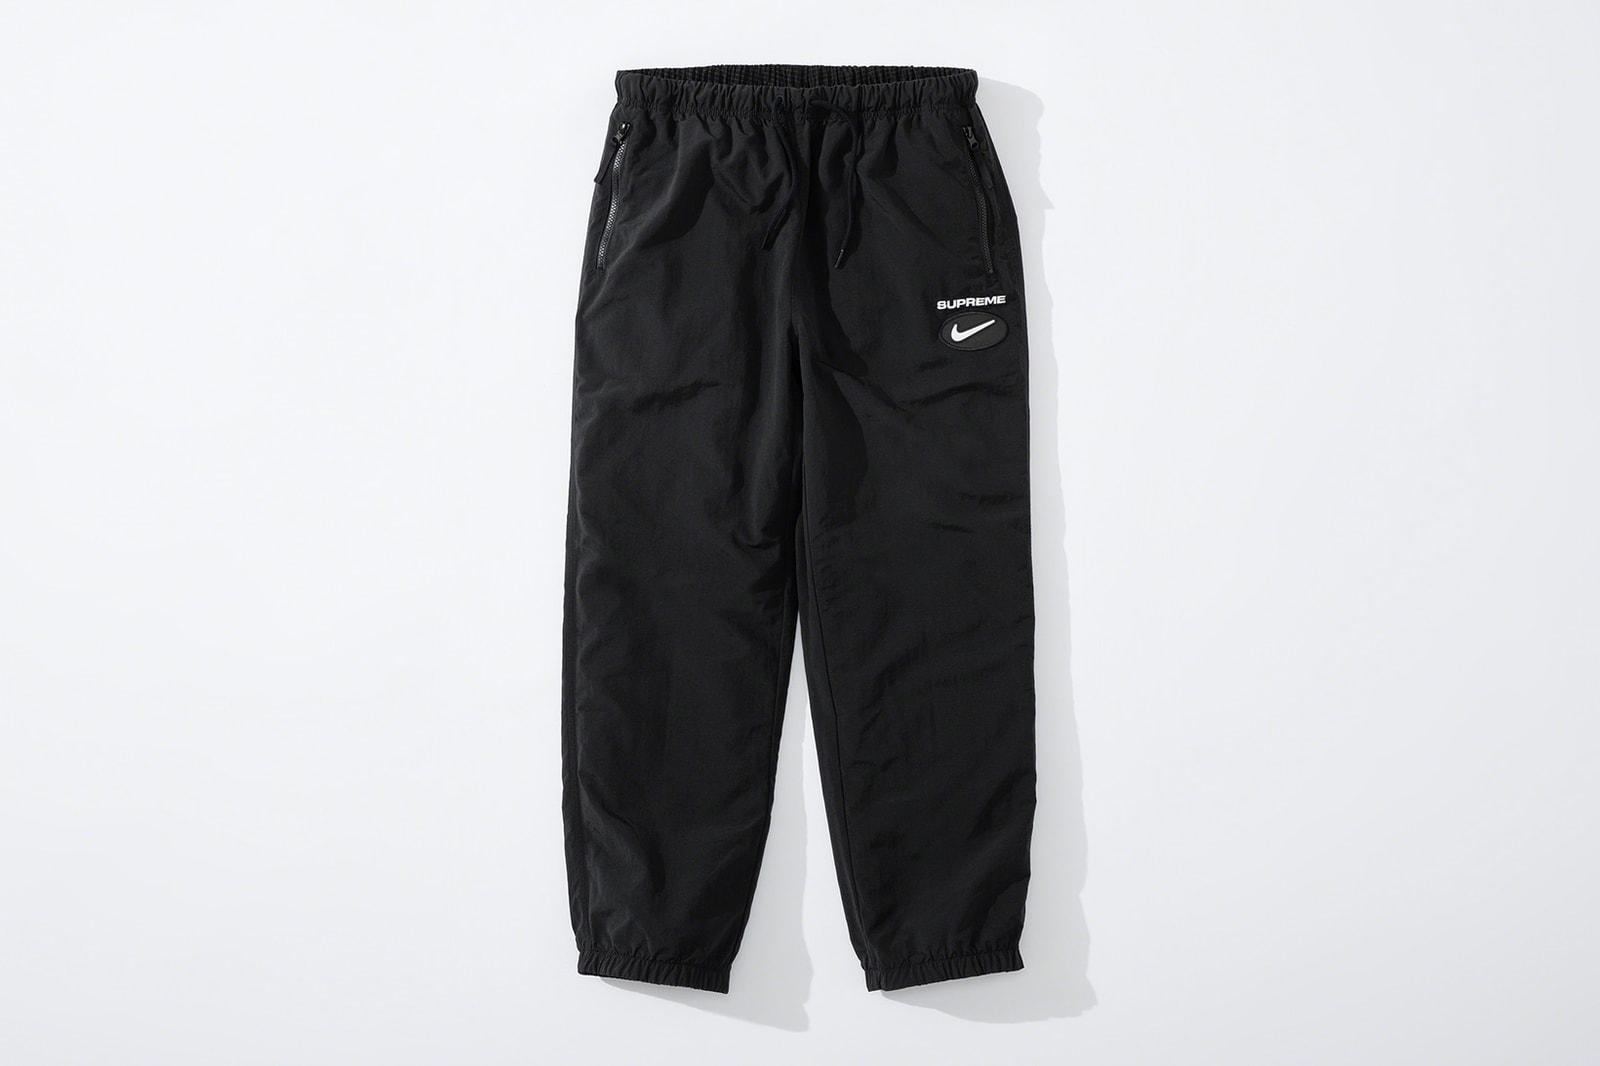 supreme nike fall collaboration release info anoraks hoodies soccer jerseys shorts sweatshirts